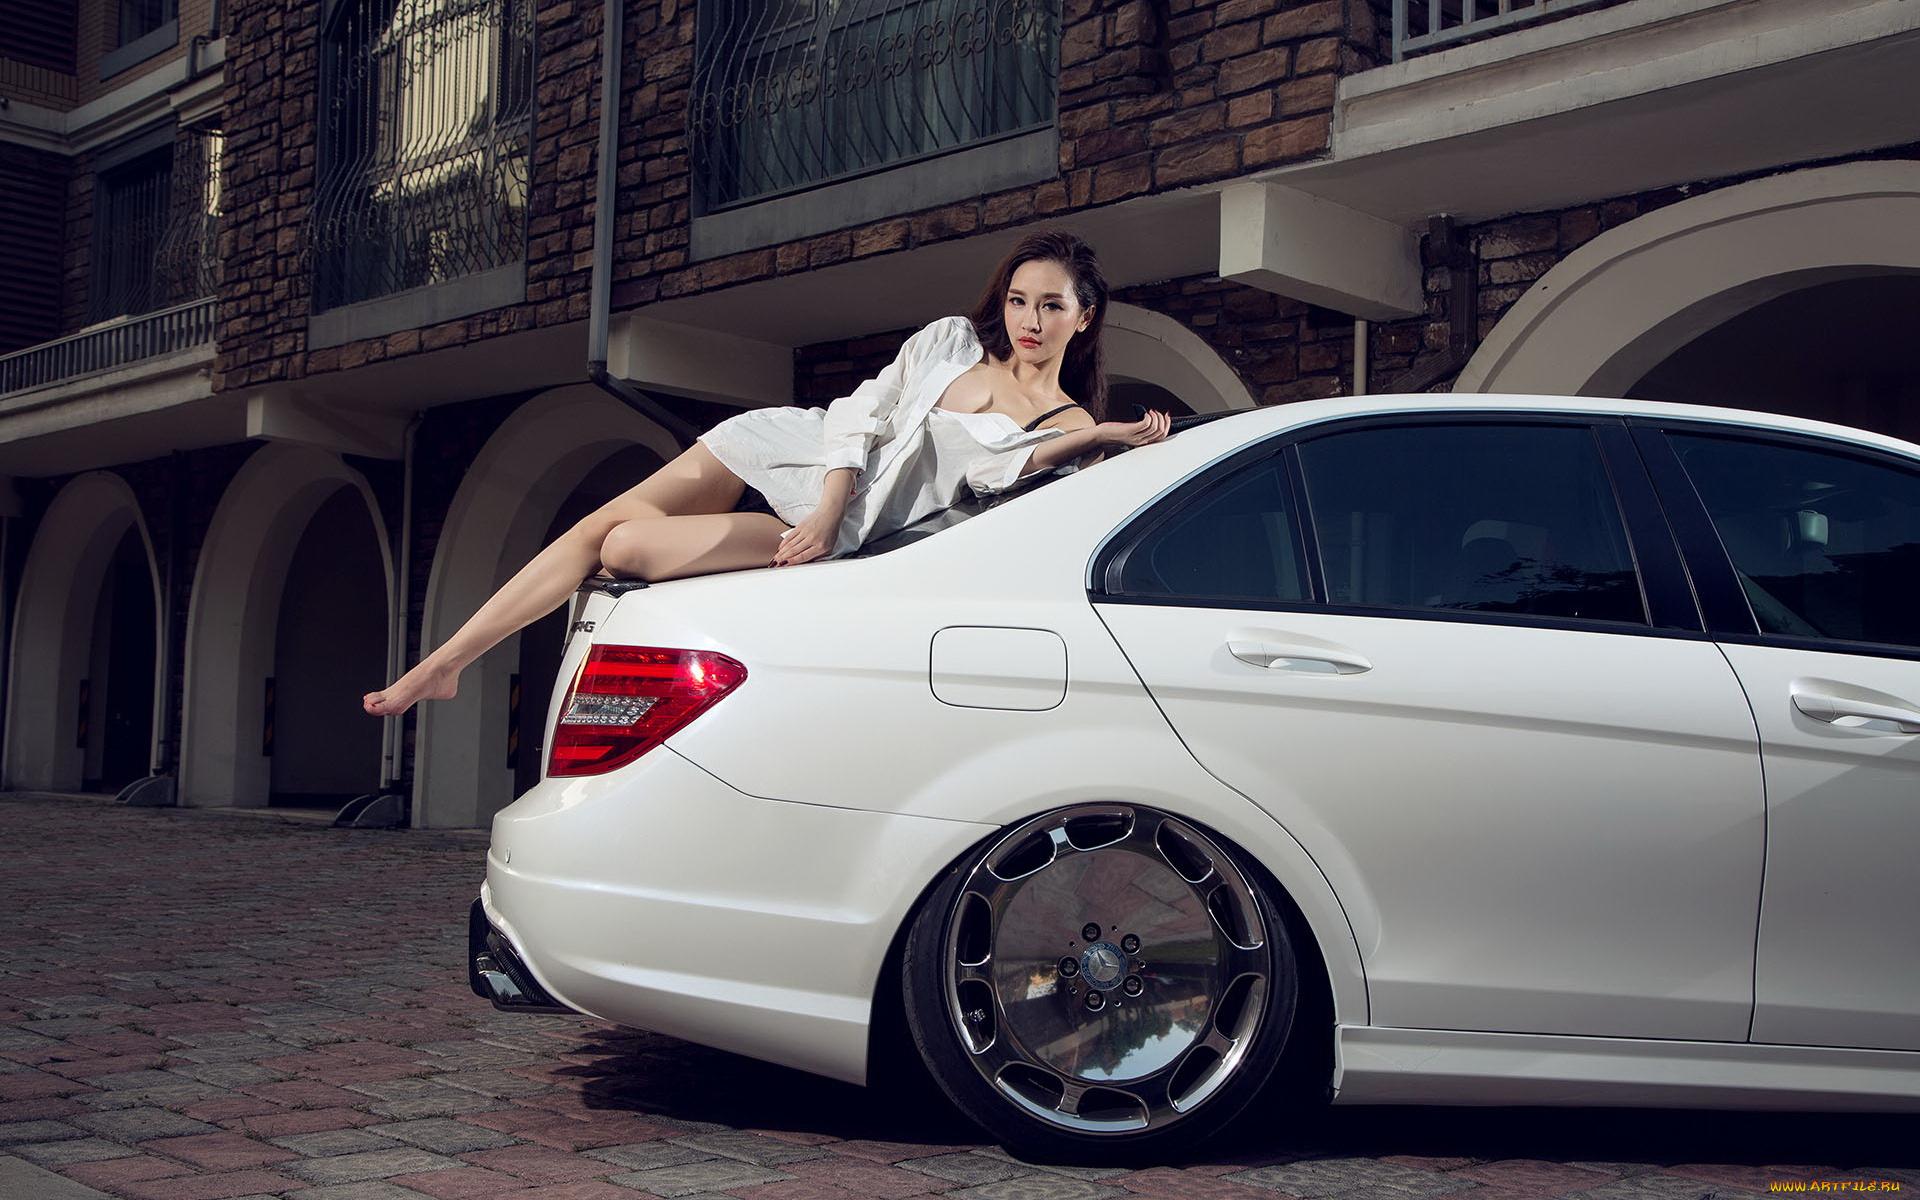 Картинки с русскими девушками и машинами мерсами